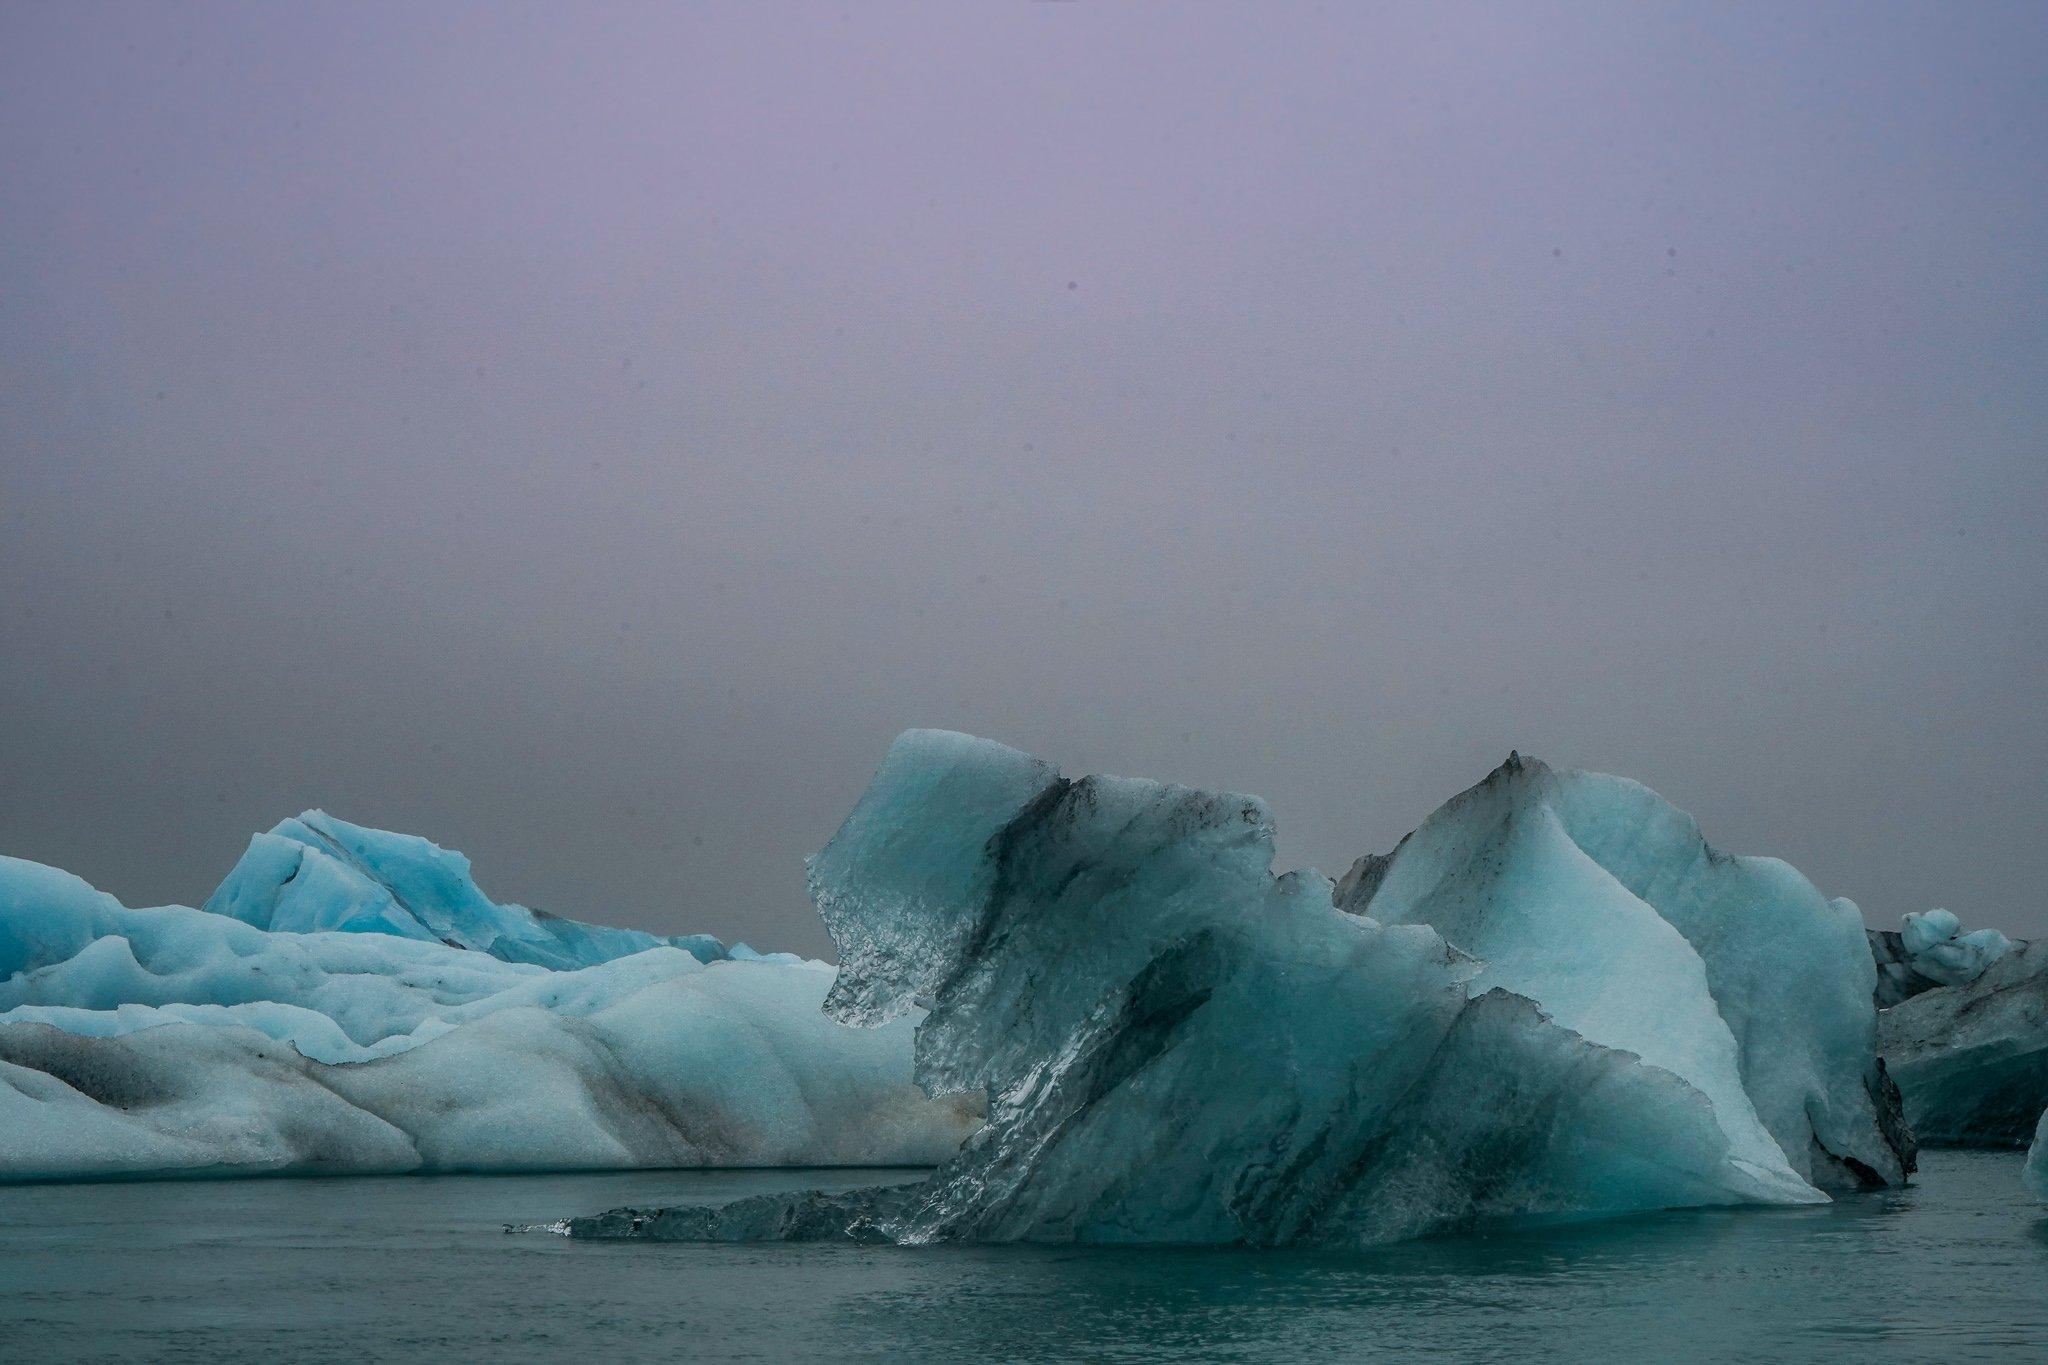 Jokulsarlon iceberg glacier lagoonfeatured in justin bieber music video